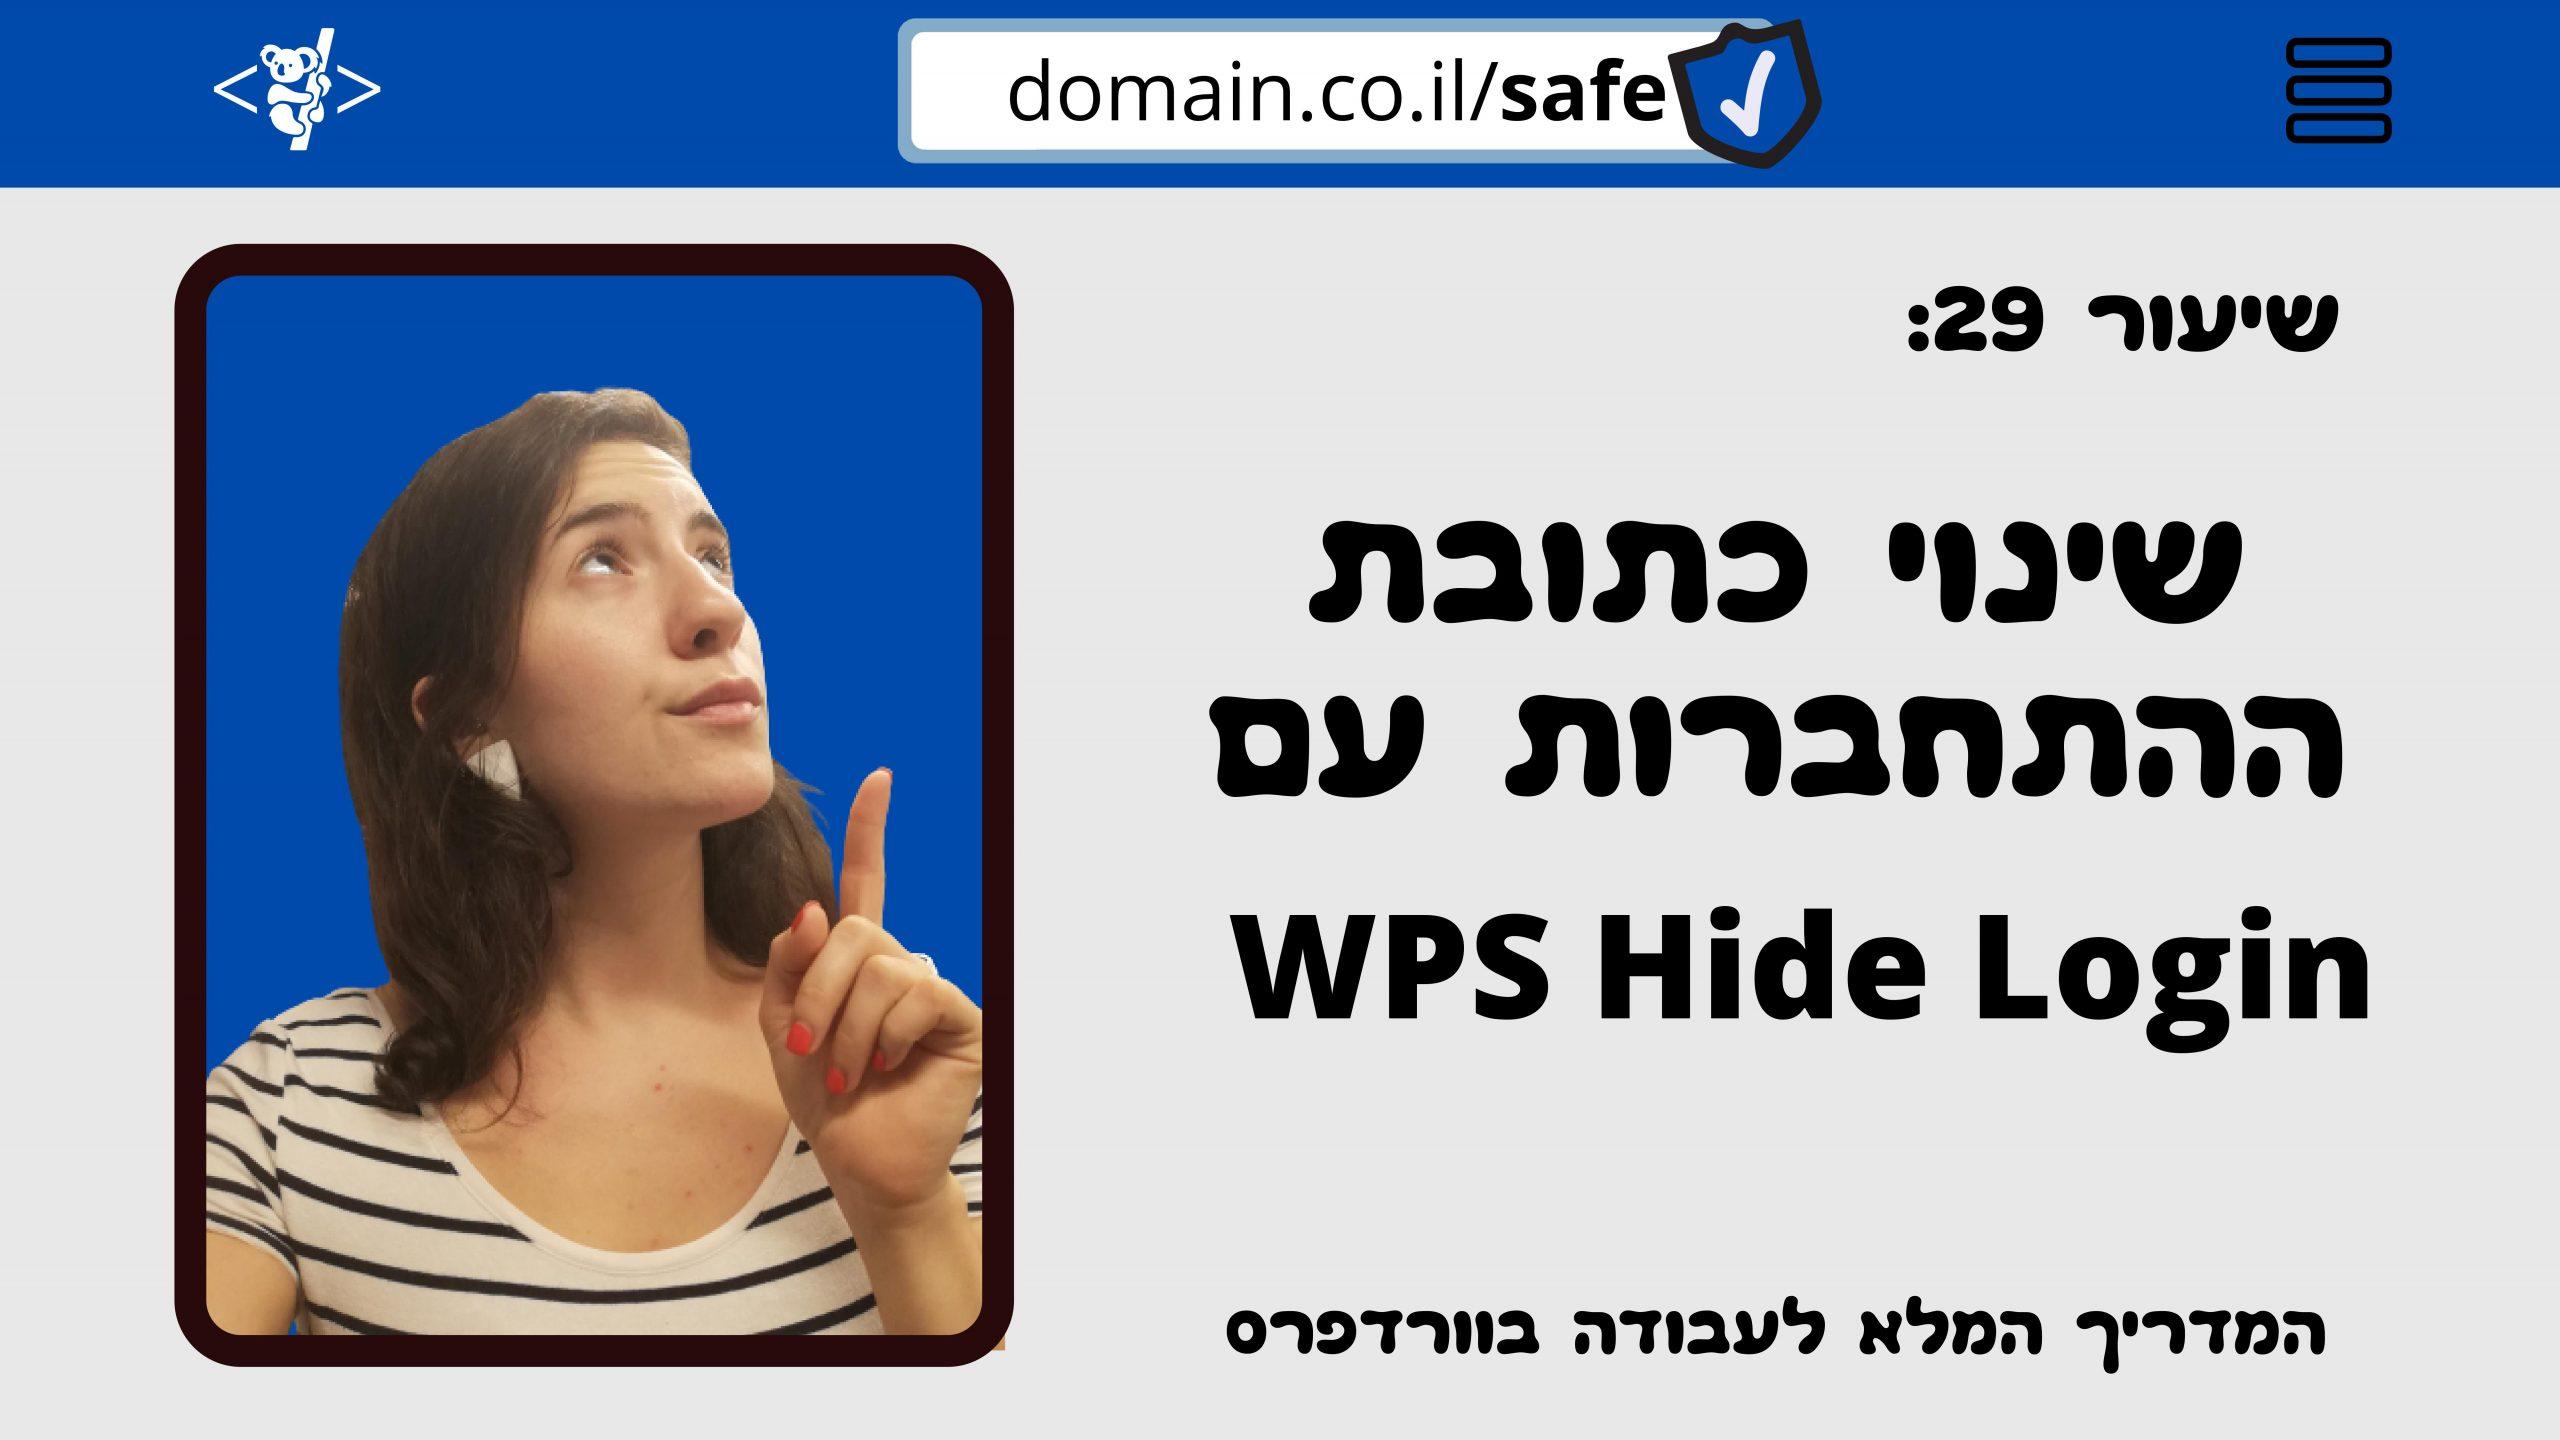 WPS Hide Login , שיר ויצמן,